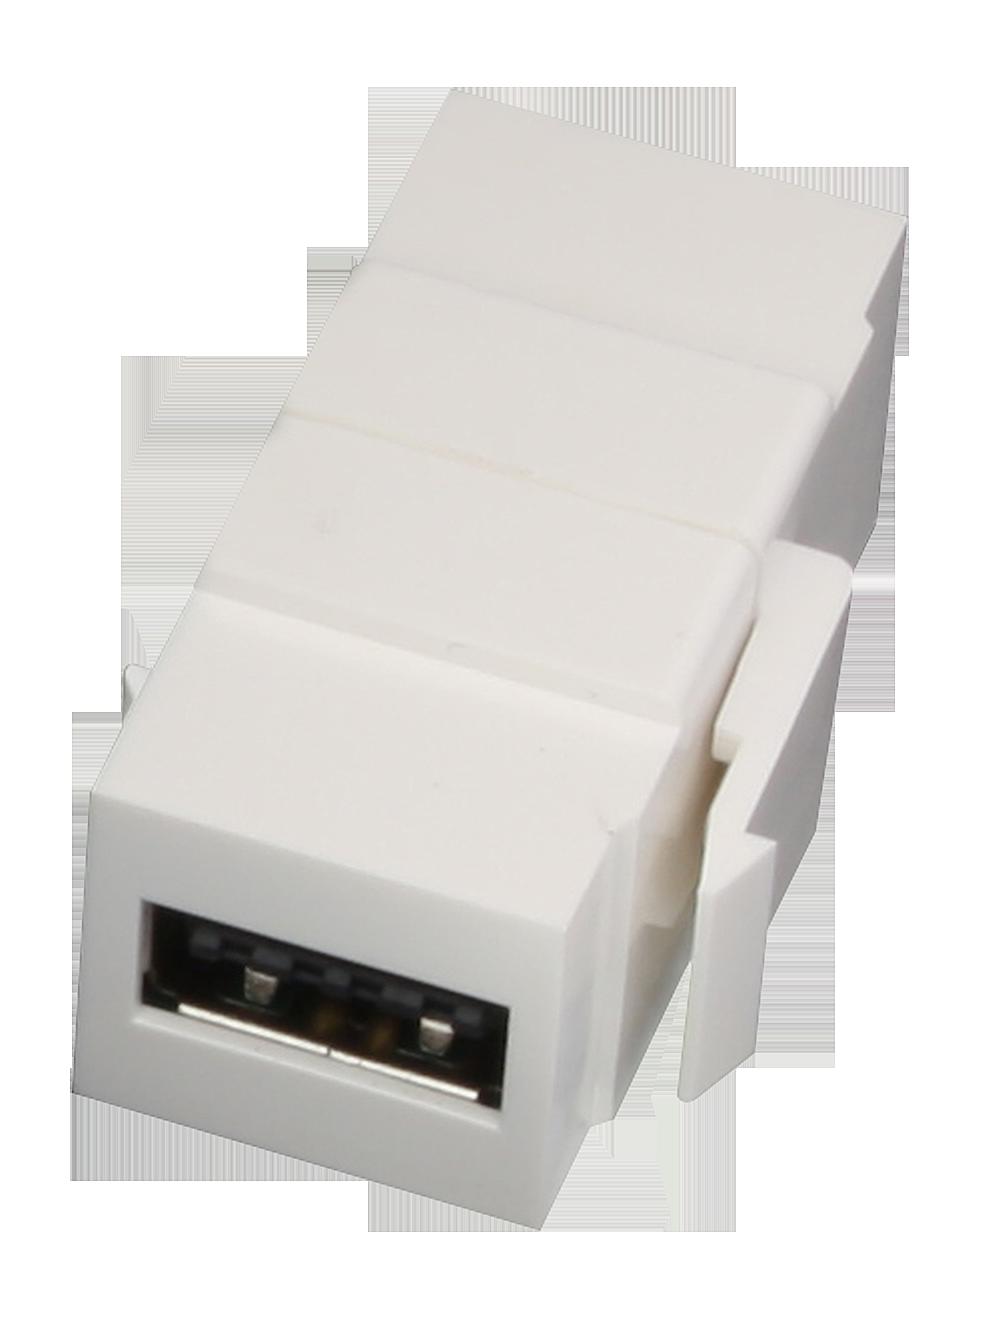 USB A Doppelkupplungs-Keystonef�r Wanddosen \reversible\